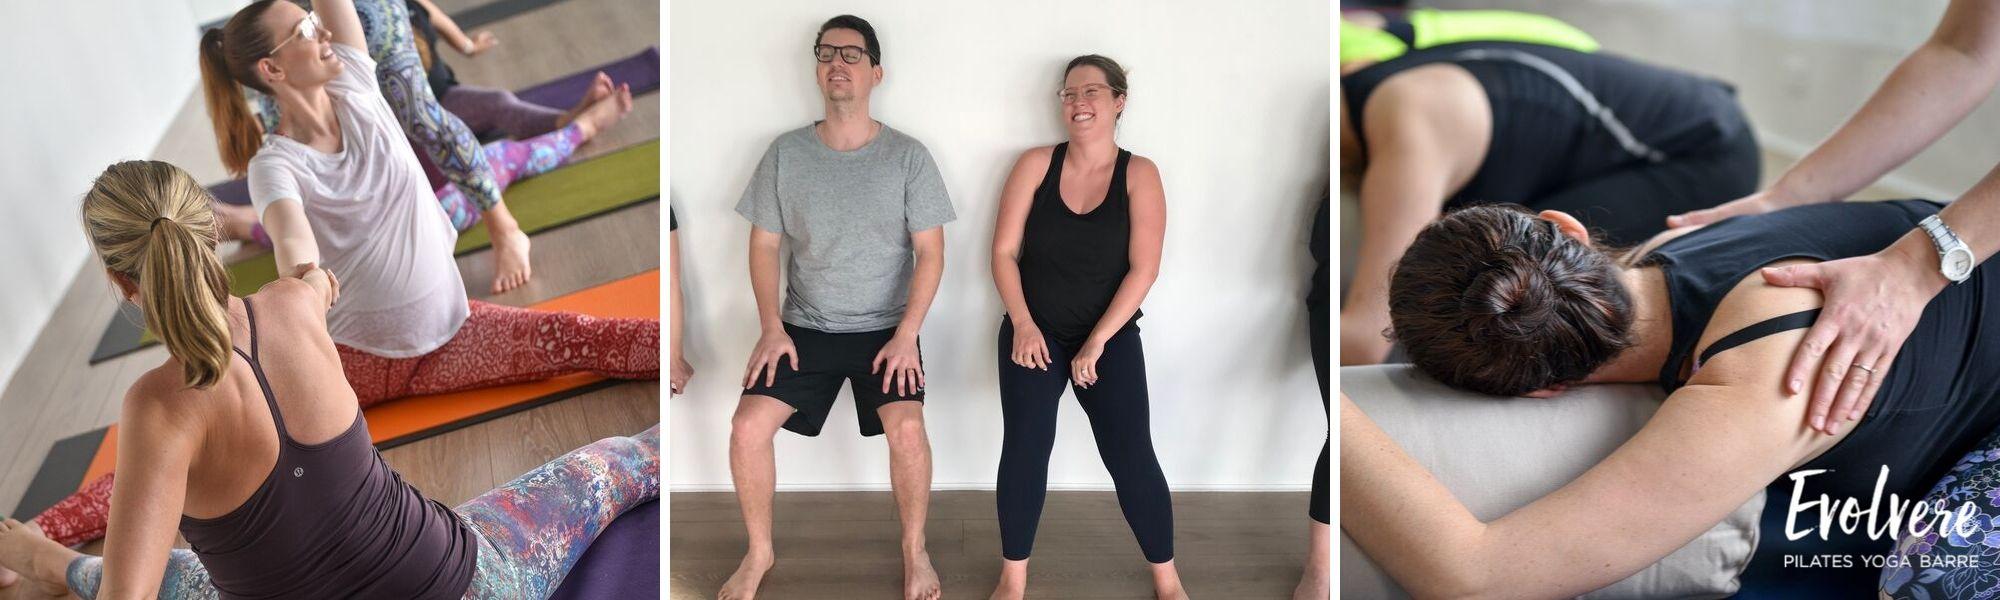 Birth preparation for couples and partners in Lane Cove Pregnancy Yoga studio Evolvere